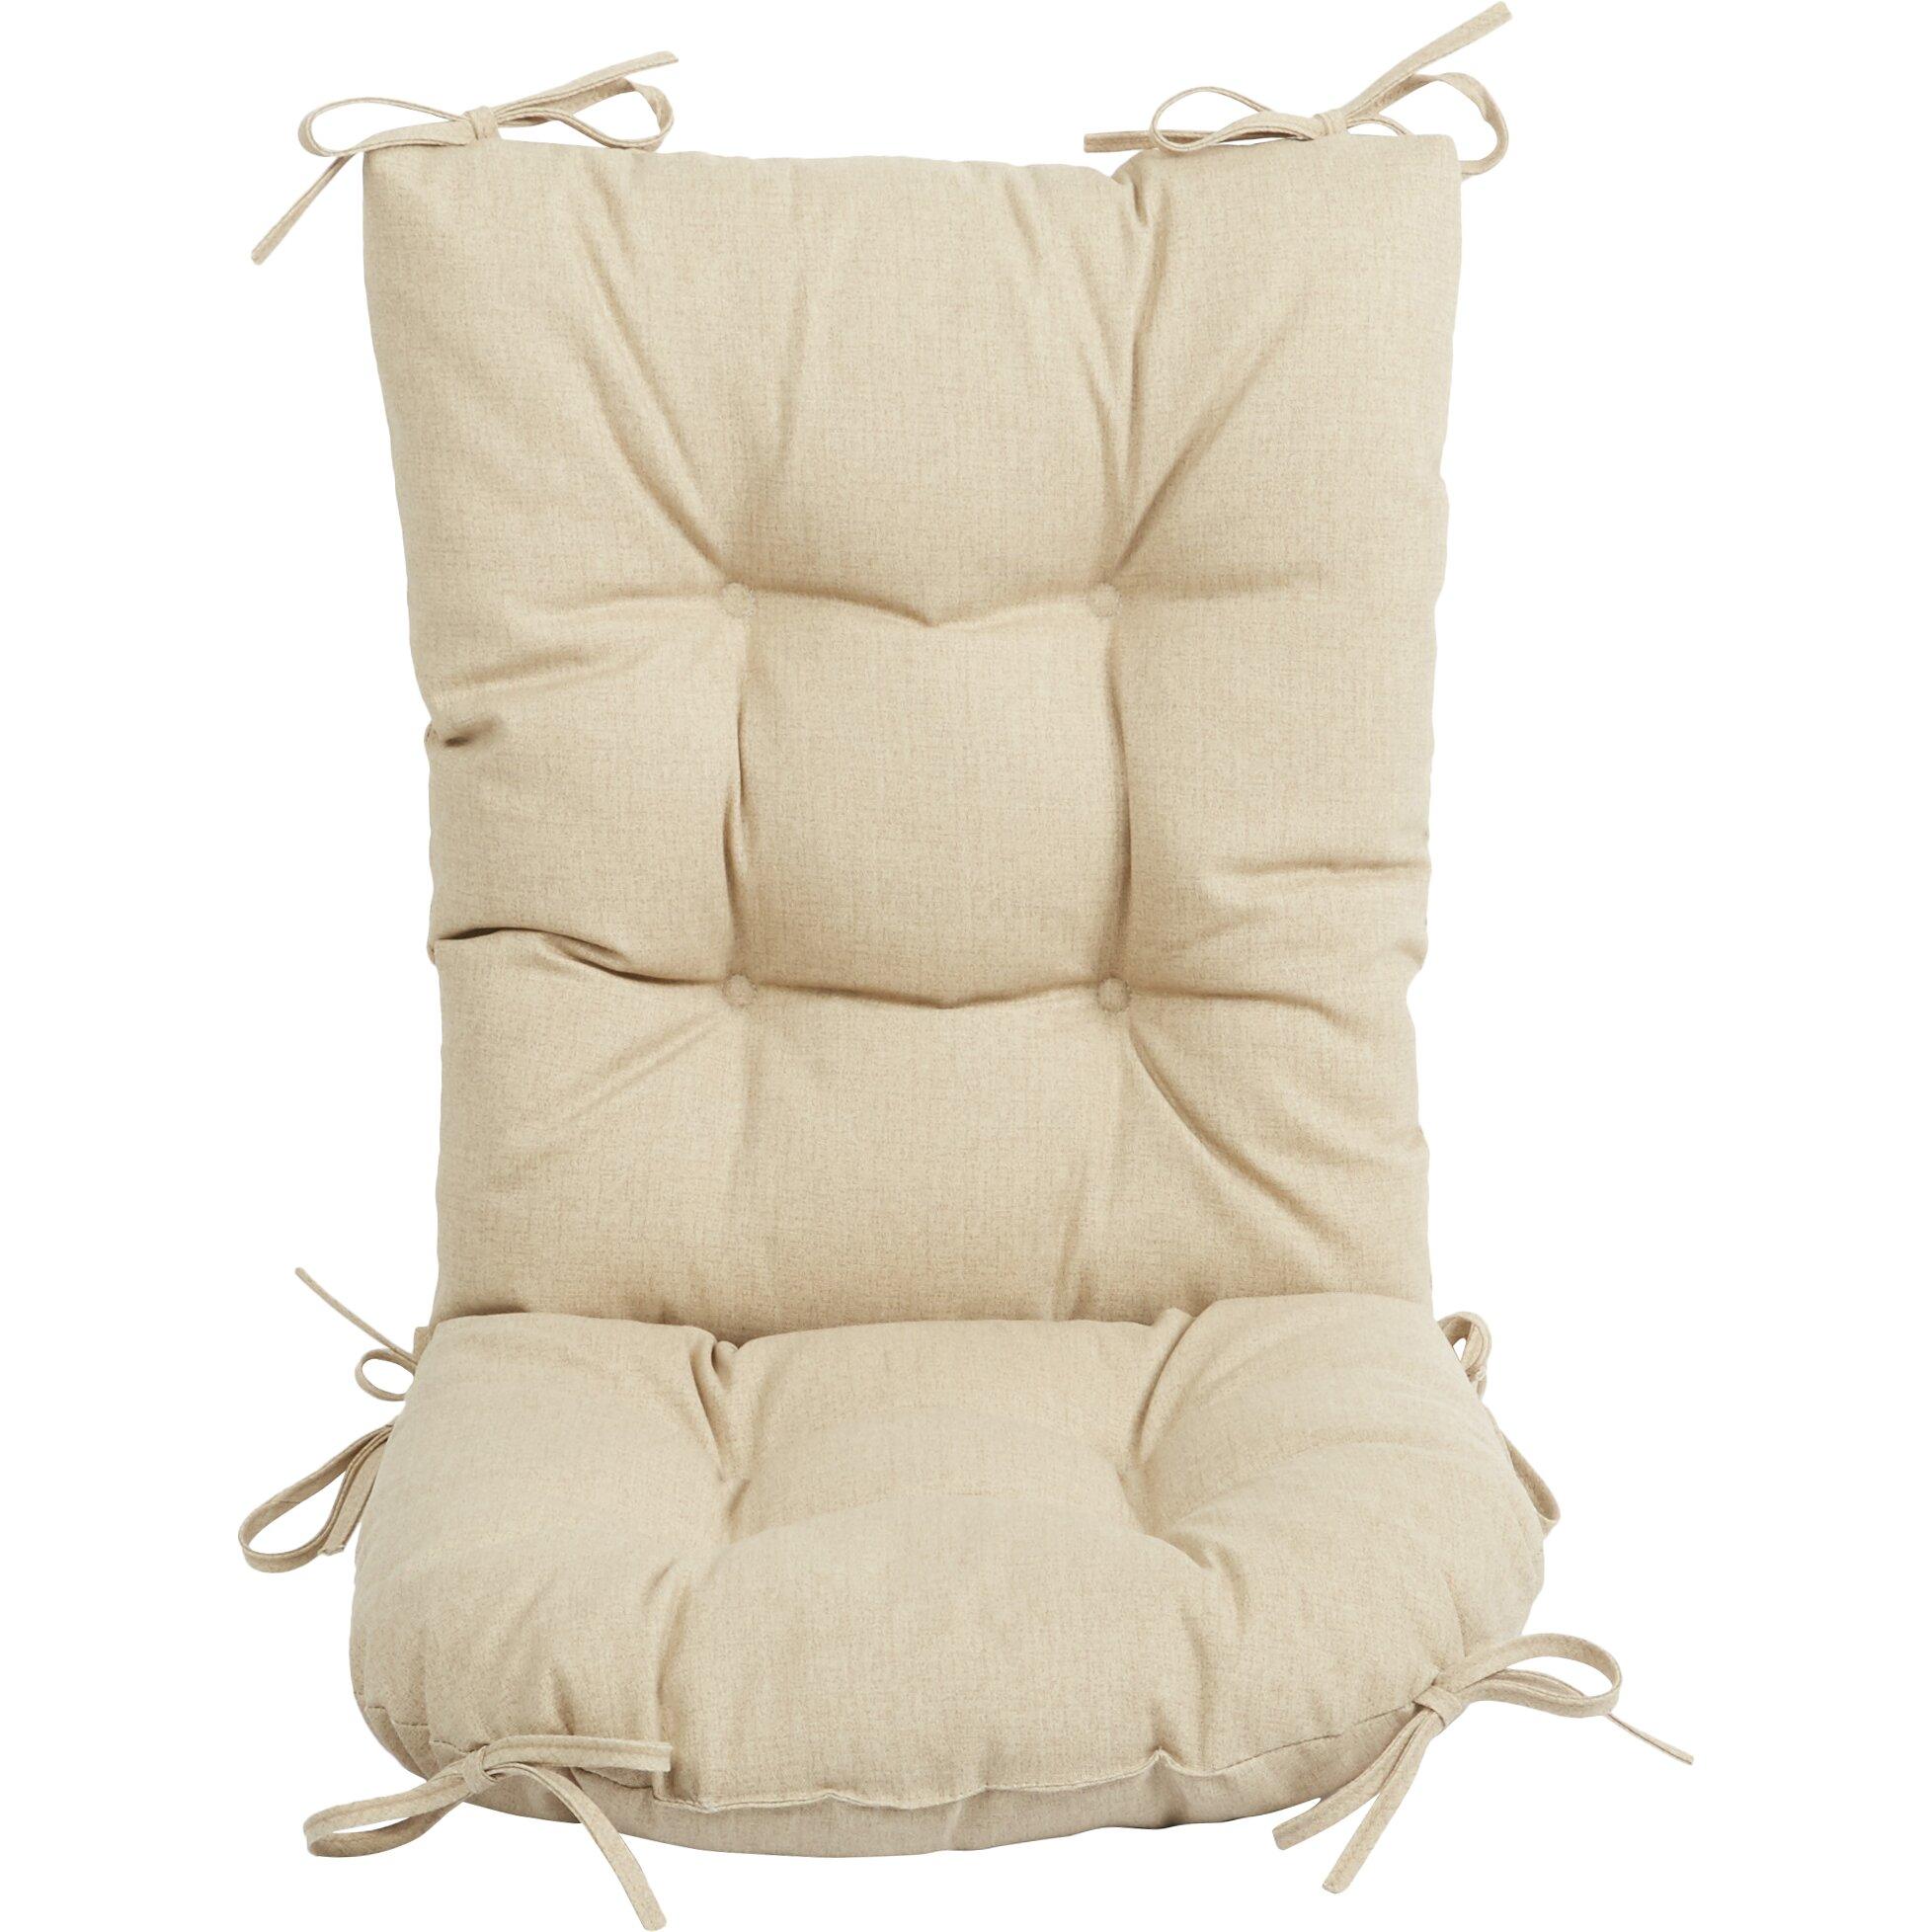 Wayfair Basics Wayfair Basics Outdoor 2 Piece Rocking Chair Cushion Set